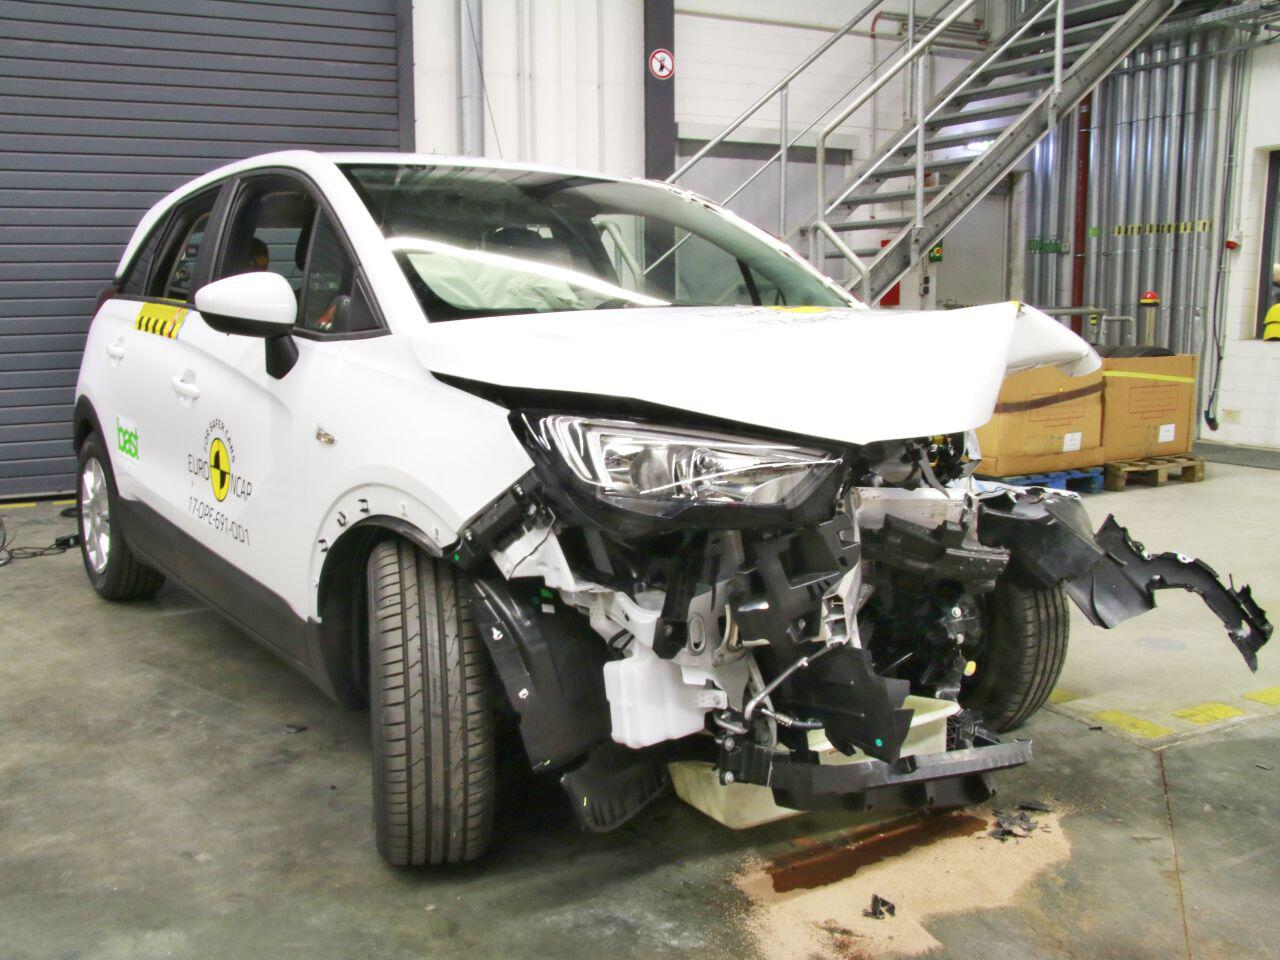 Bild zu Sieger Minivan: Opel Crossland X